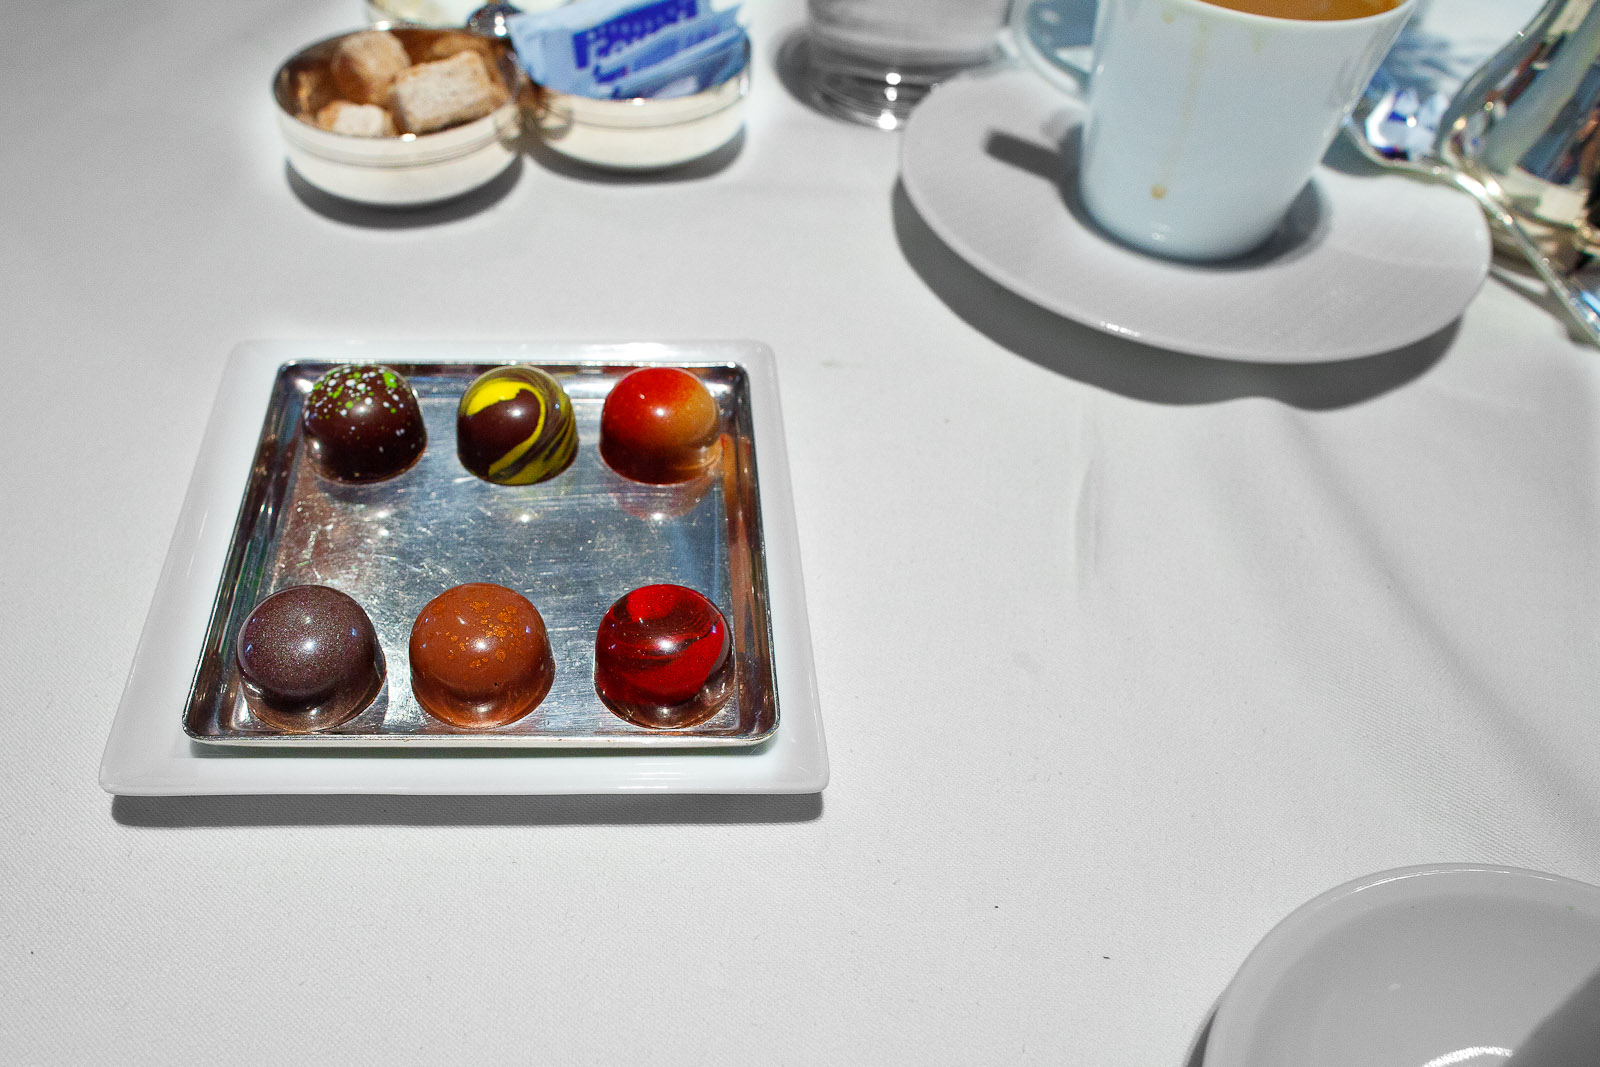 Mignardises- Chocolates - (clockwise) Olive Oil, Meyer Lemon, Peanut Butter and Jelly, Michigan Cherry, Hazelnut, Ginger